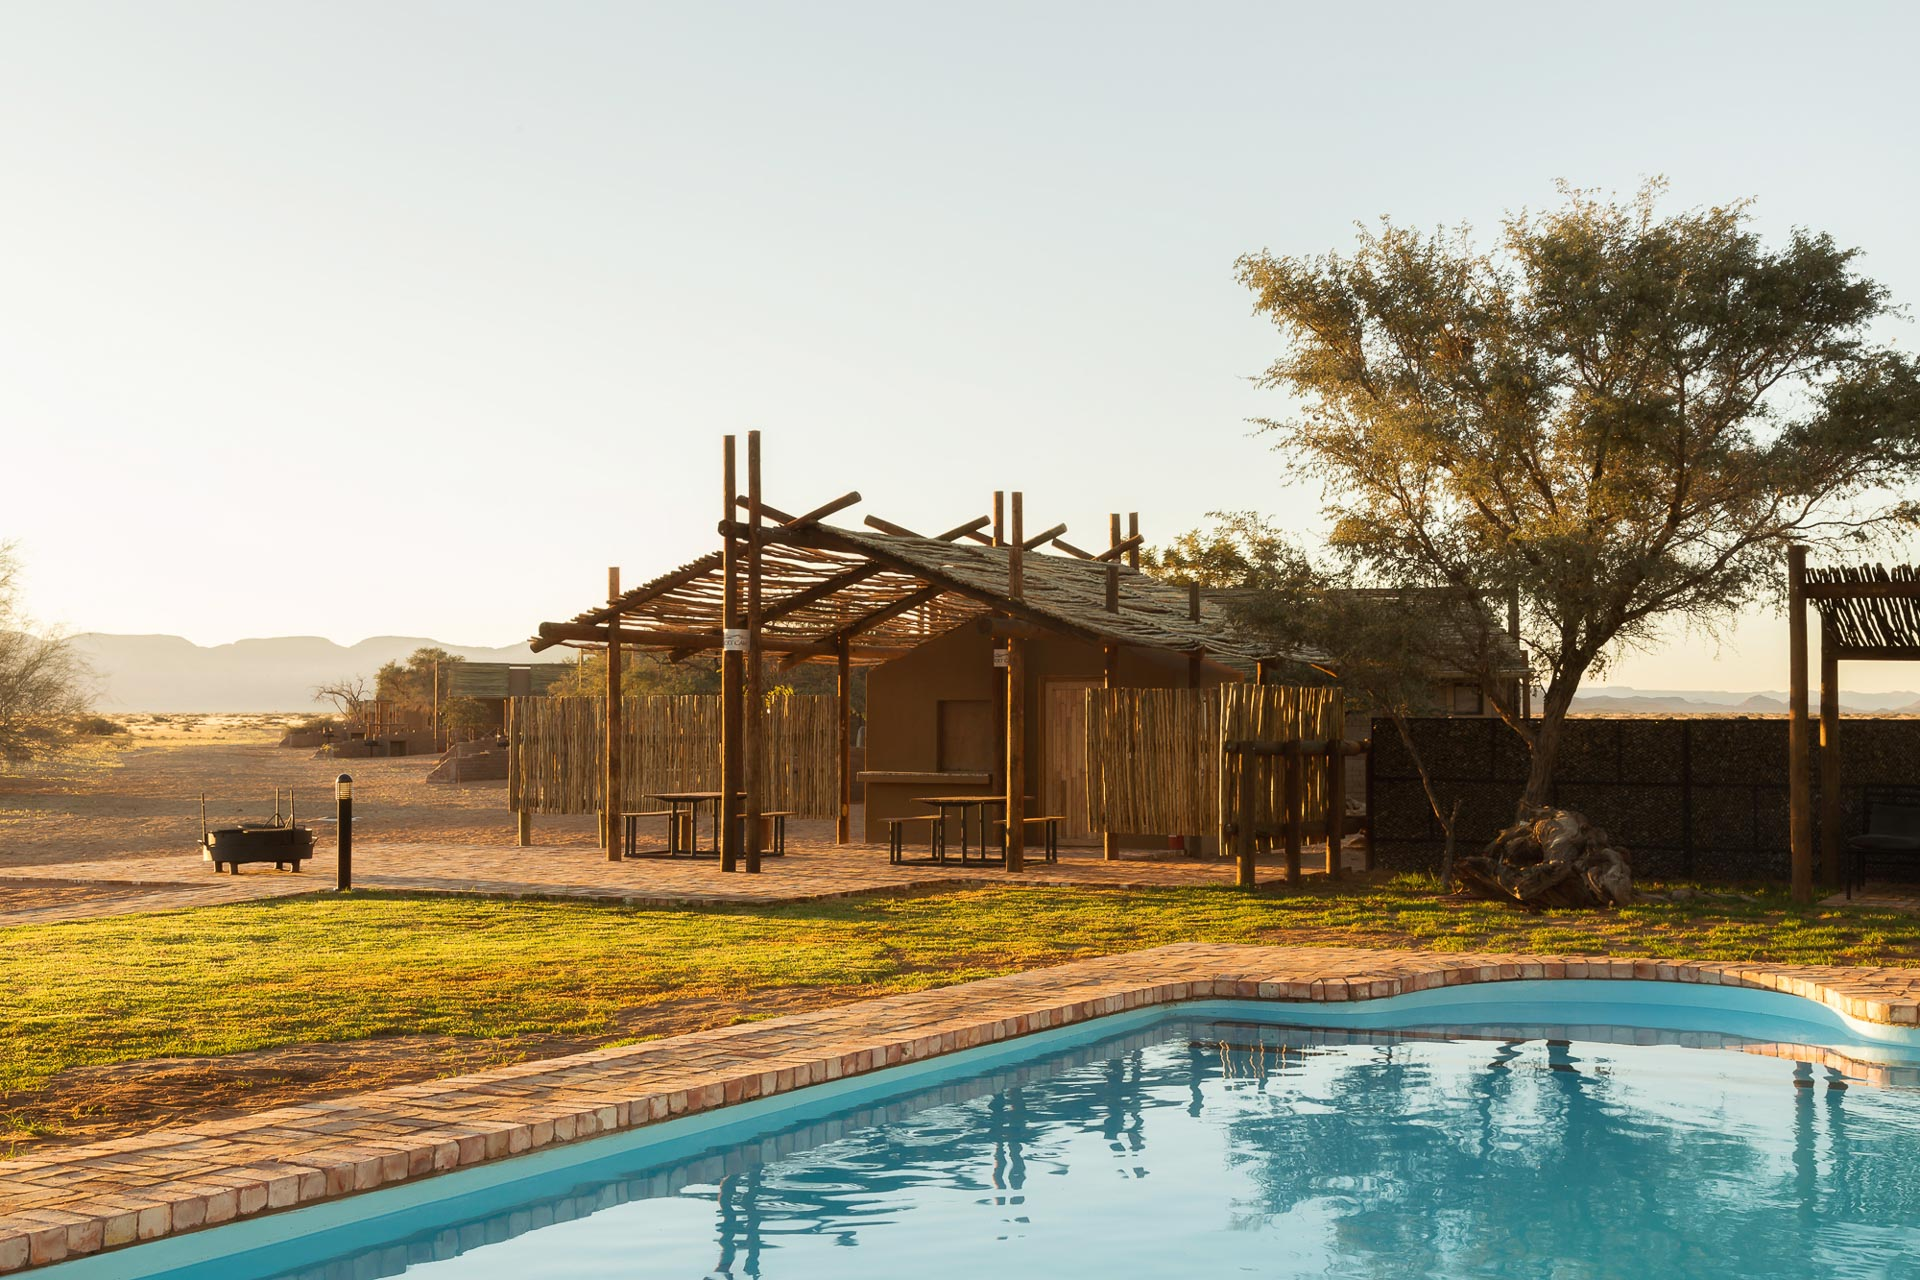 Desert-Camp-Namibia-29